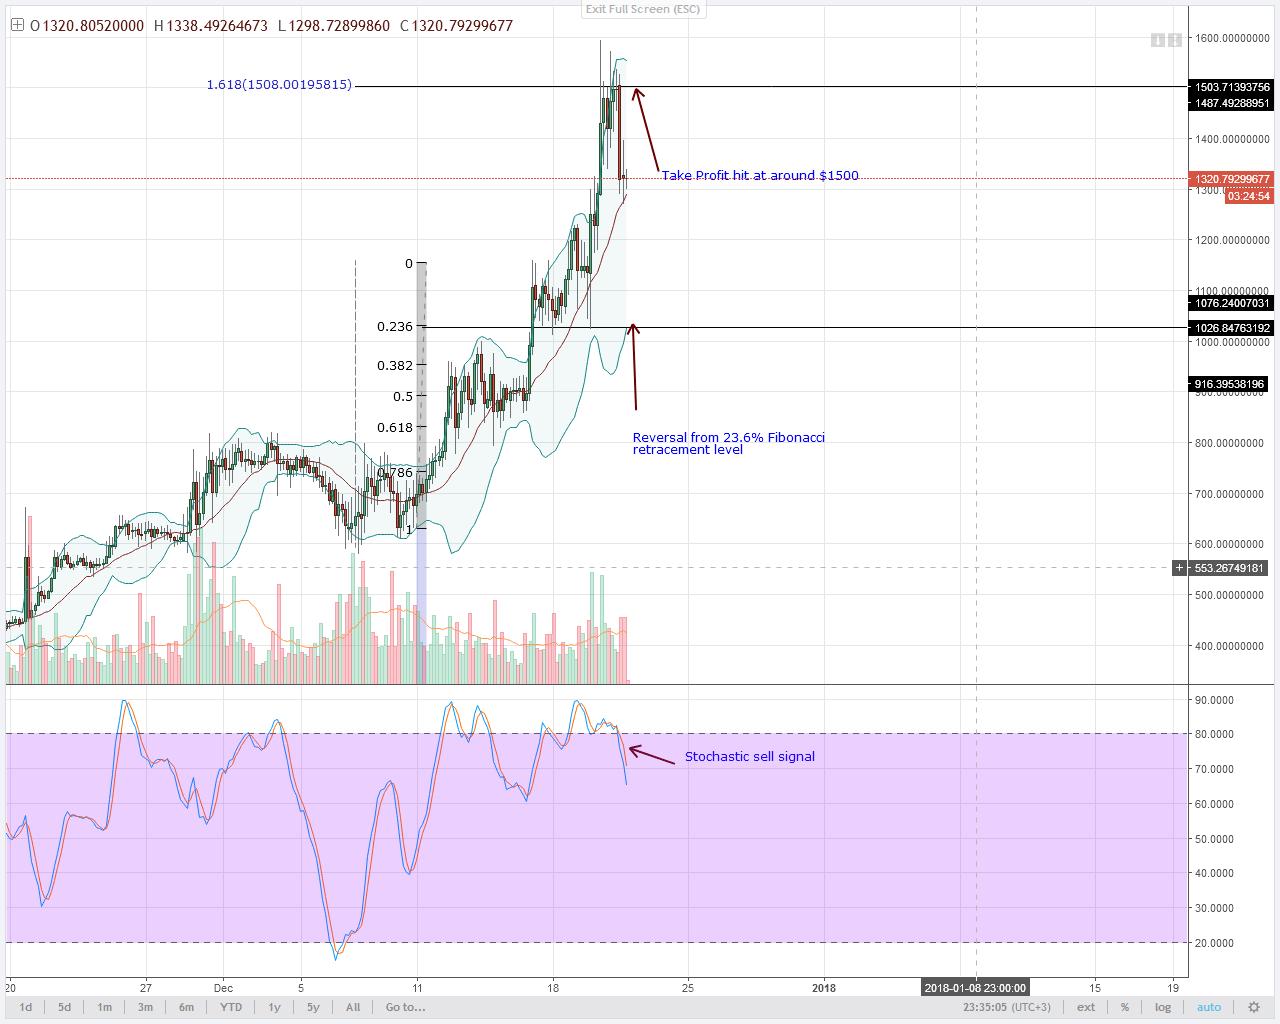 DASH Bears 4HR chart technical analysis